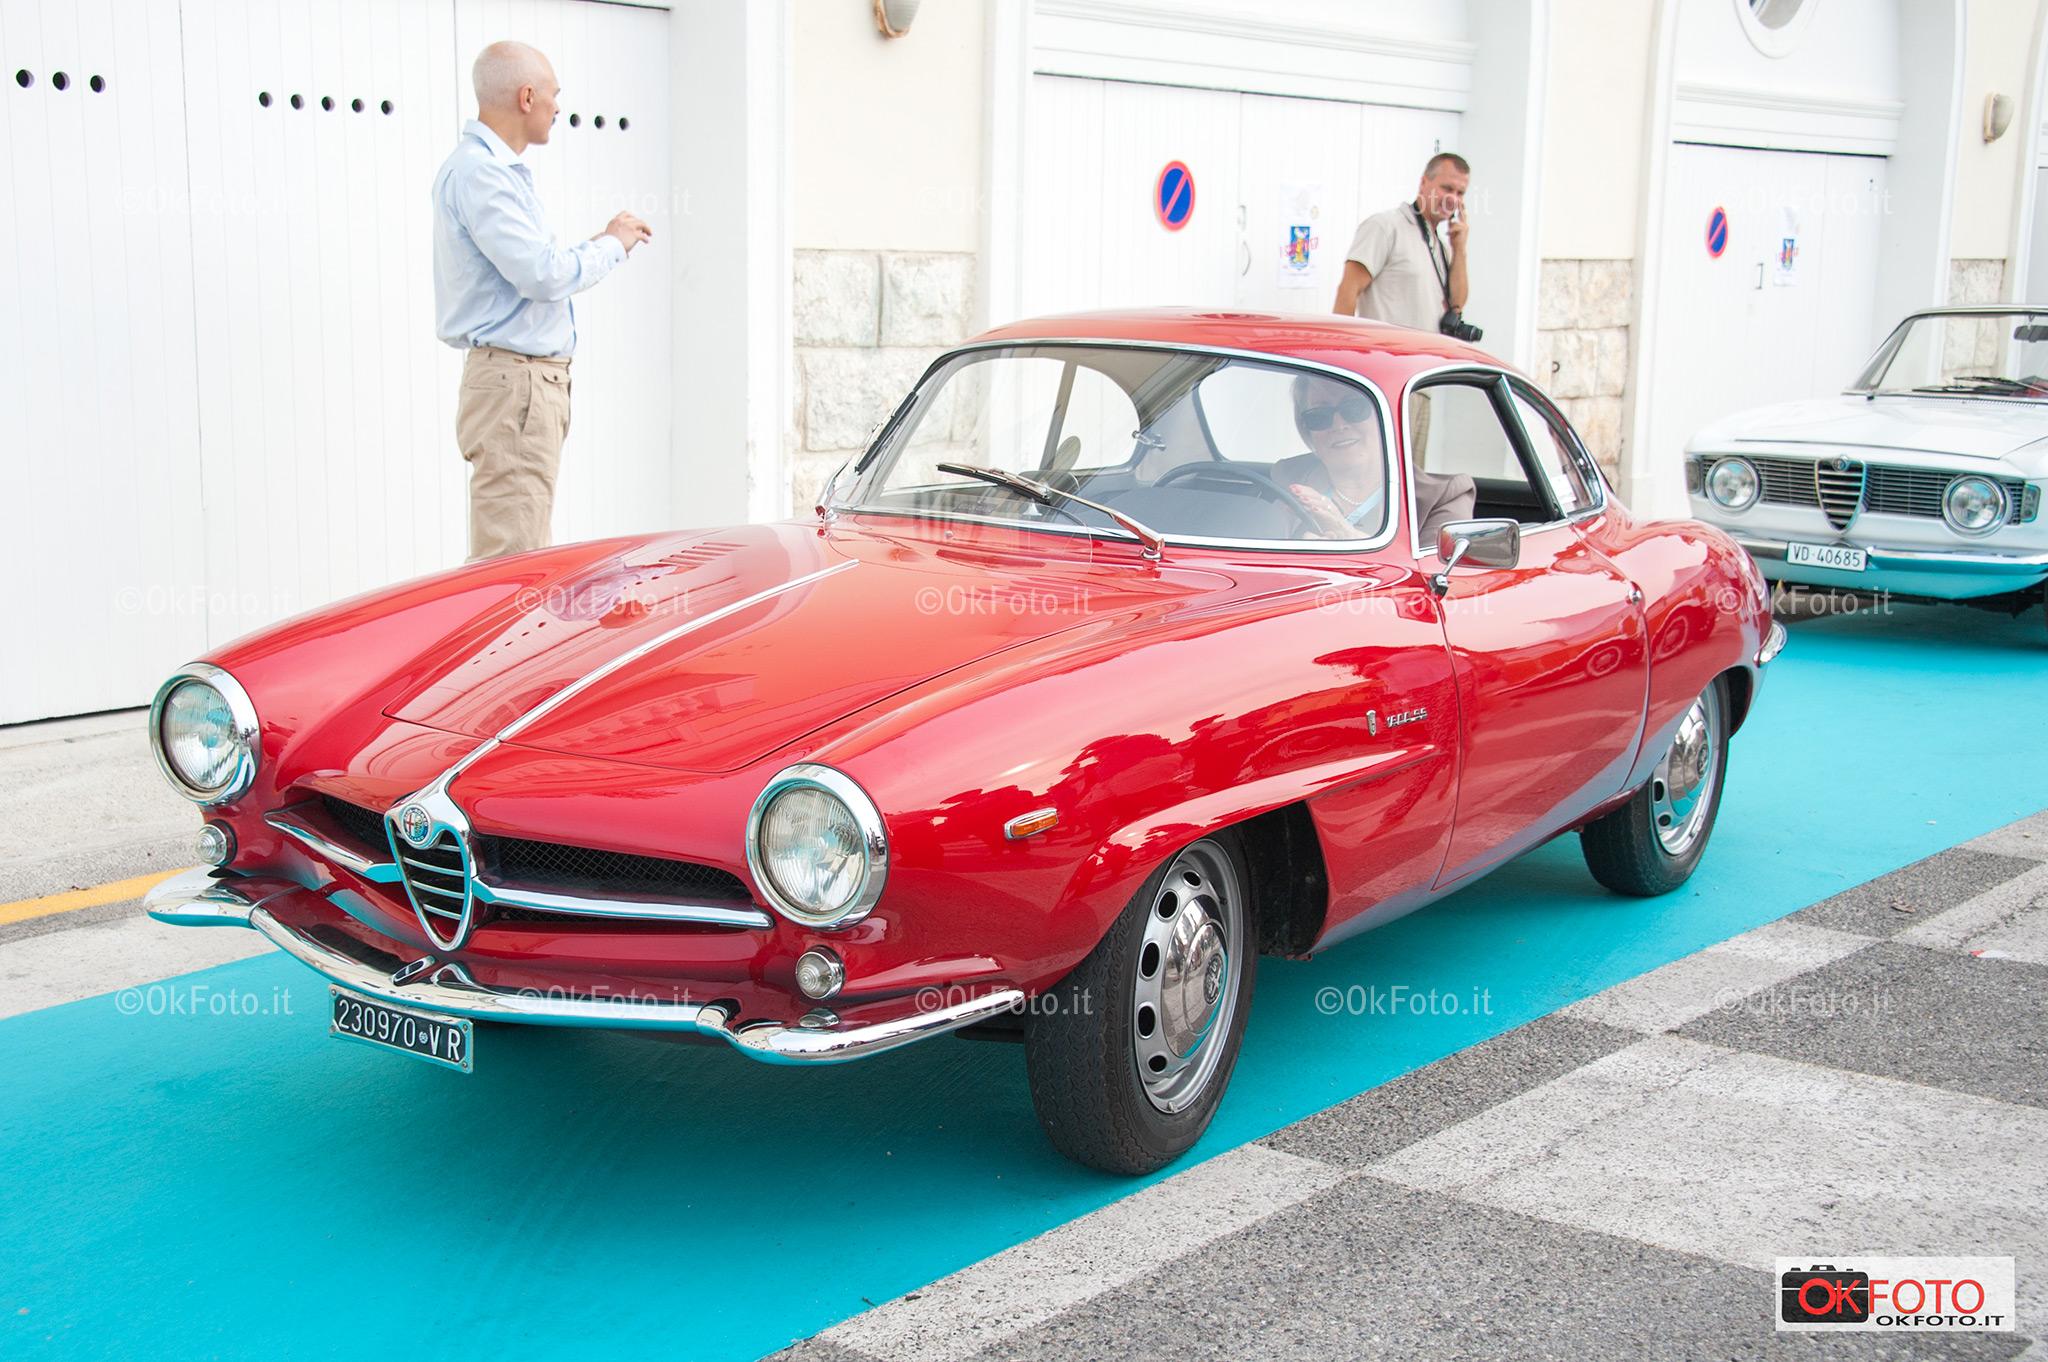 Alfa Romeo Giulia SS al concorso Saint-Jean-Cap-Ferrat Prestige